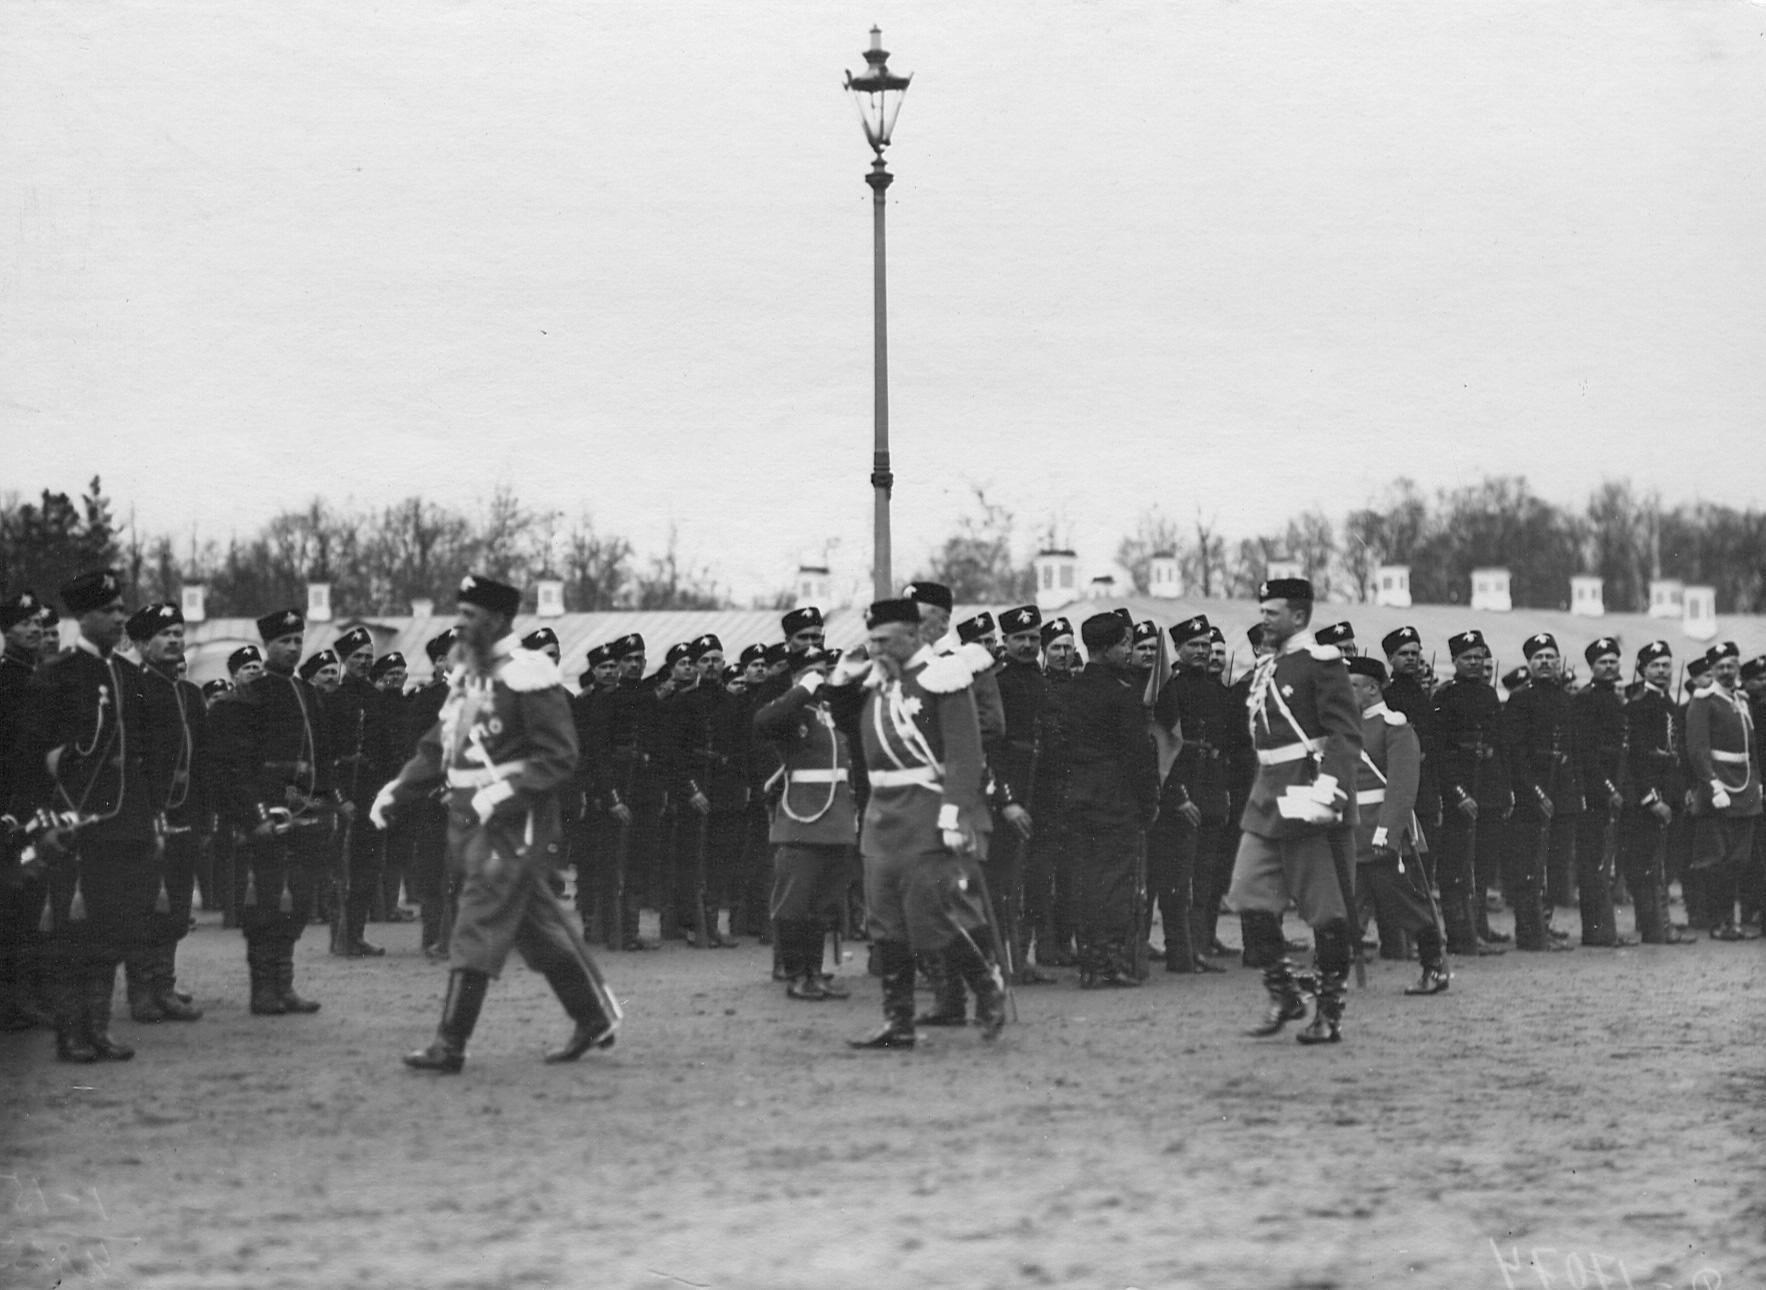 Парад 2-го стрелкового Царскосельского батальона. 21 апреля 1905